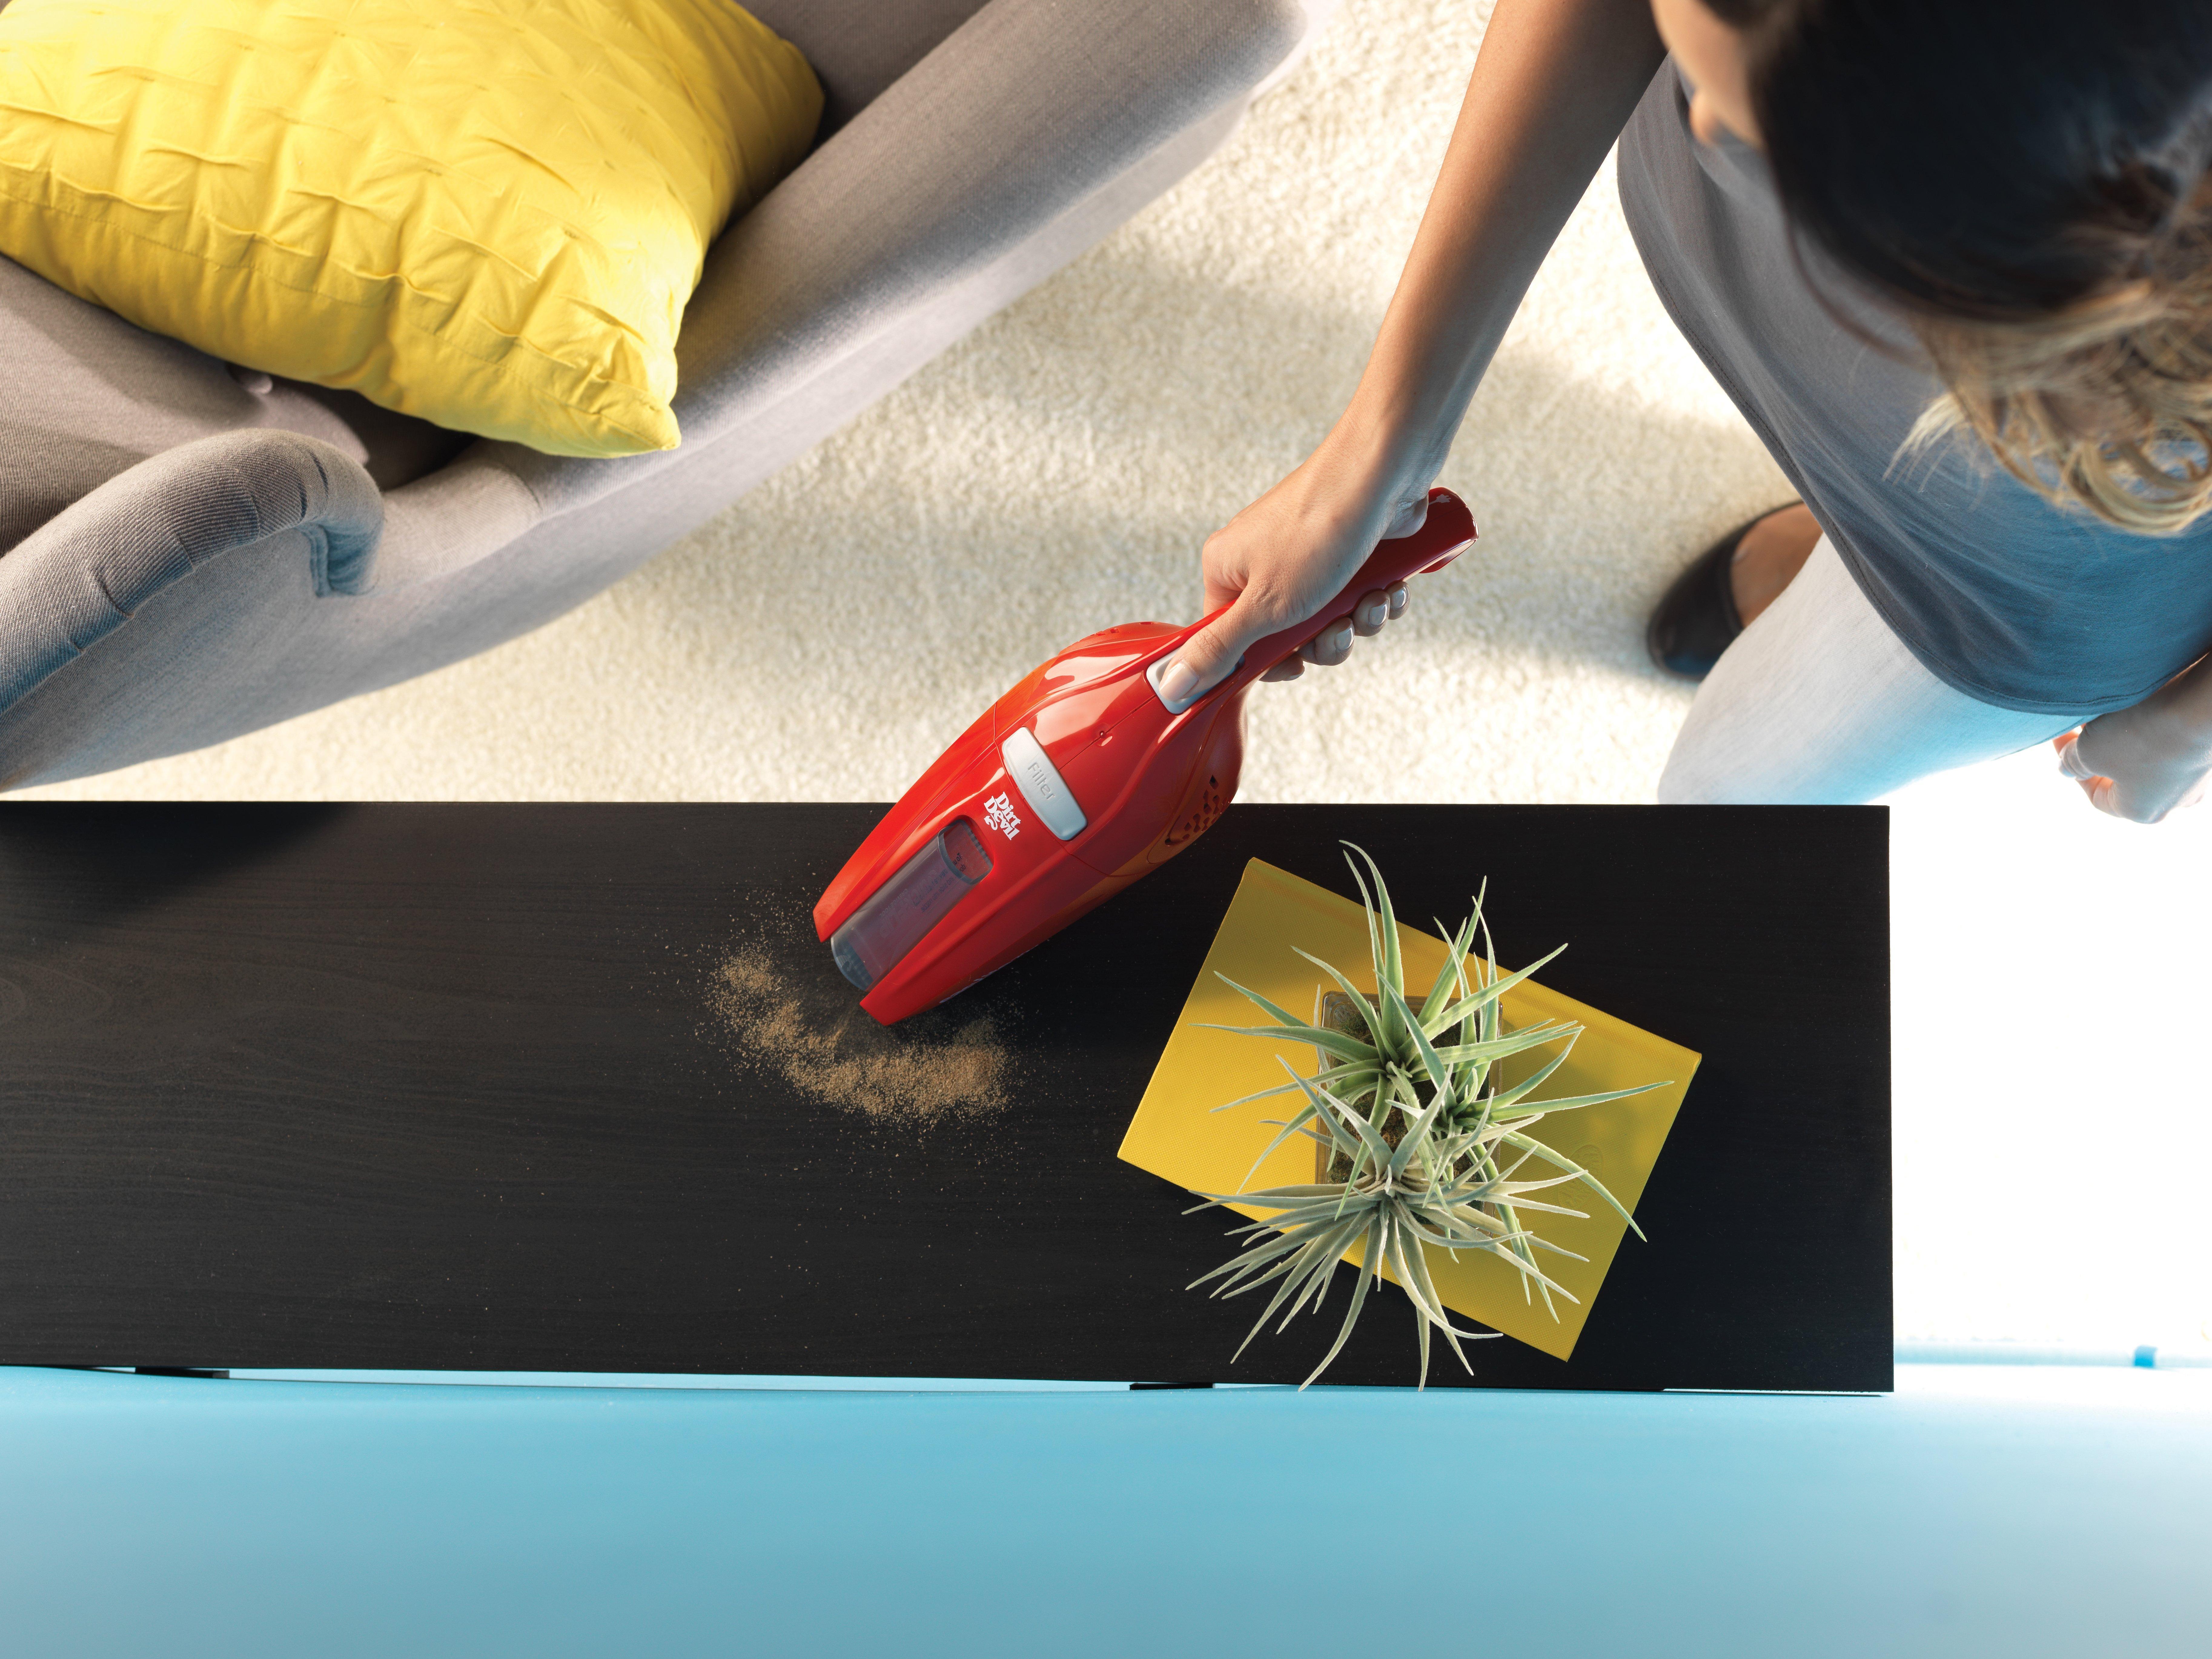 Easy Lite 7.2V Cordless Hand Vacuum5